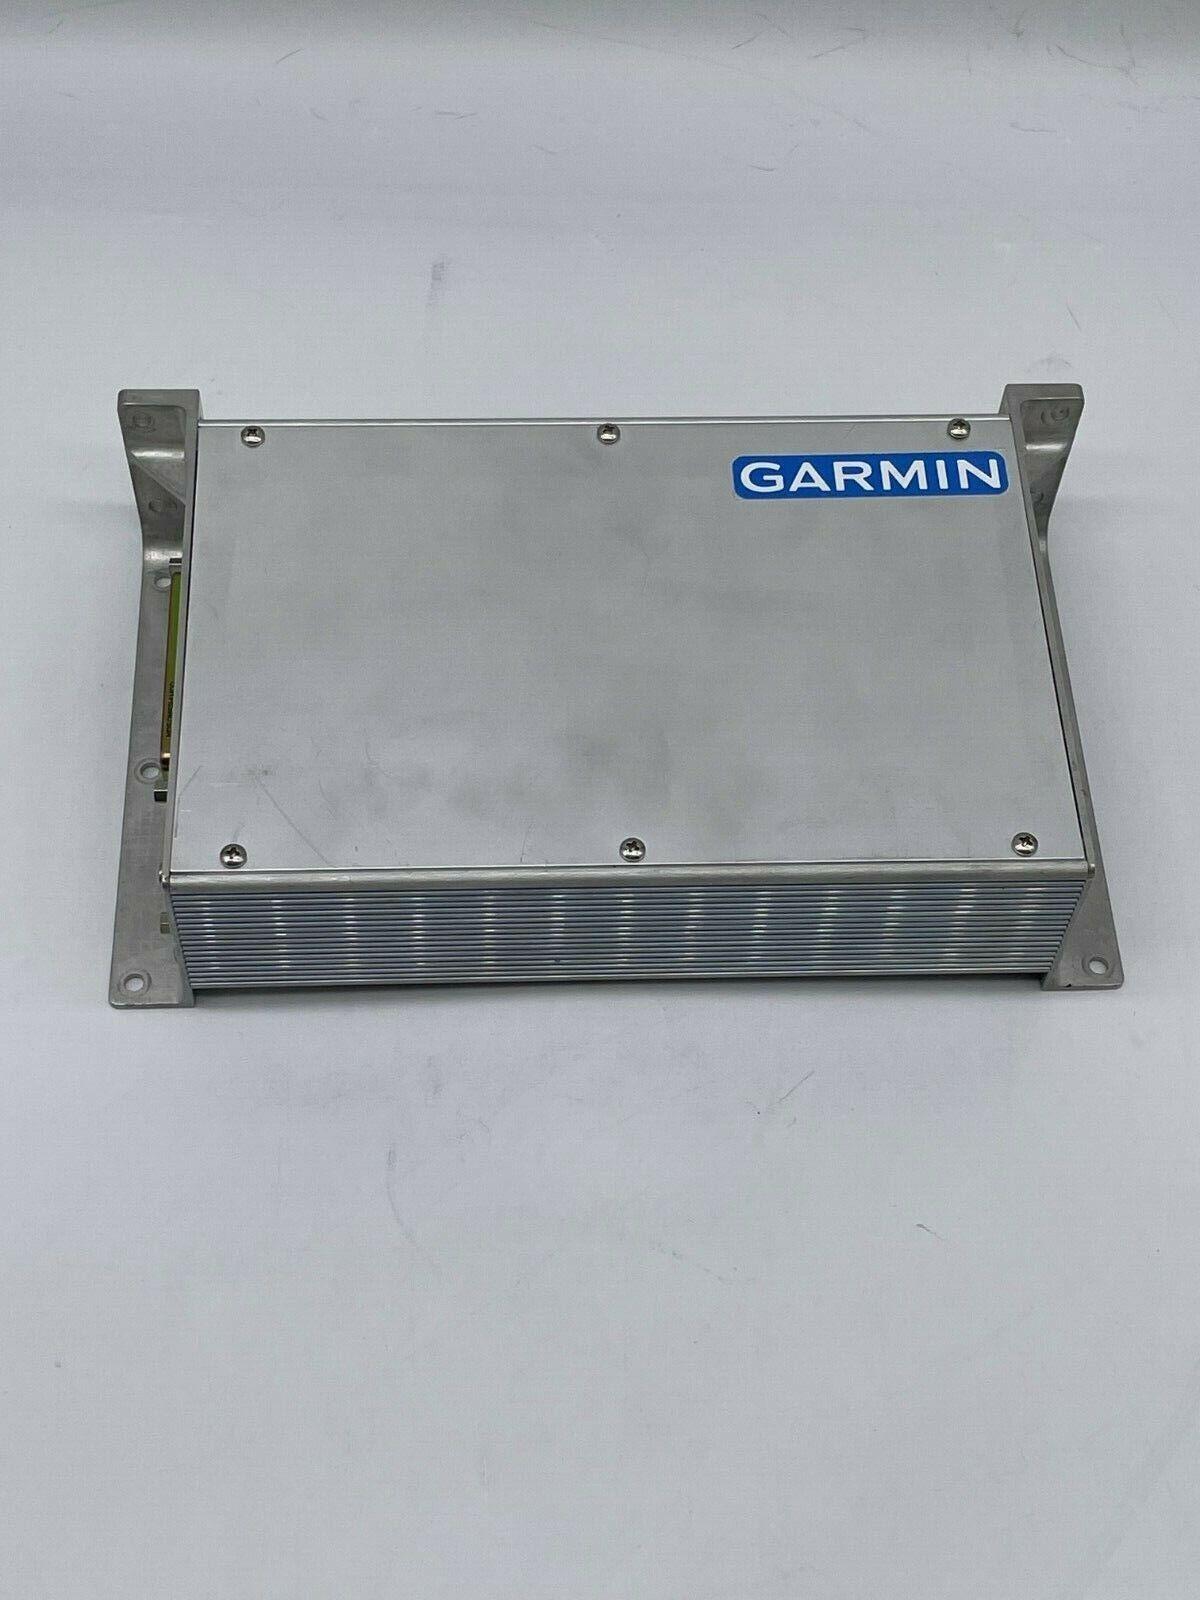 Garmin GAD 43E Autopilot Adapter P/N 011-02349-00